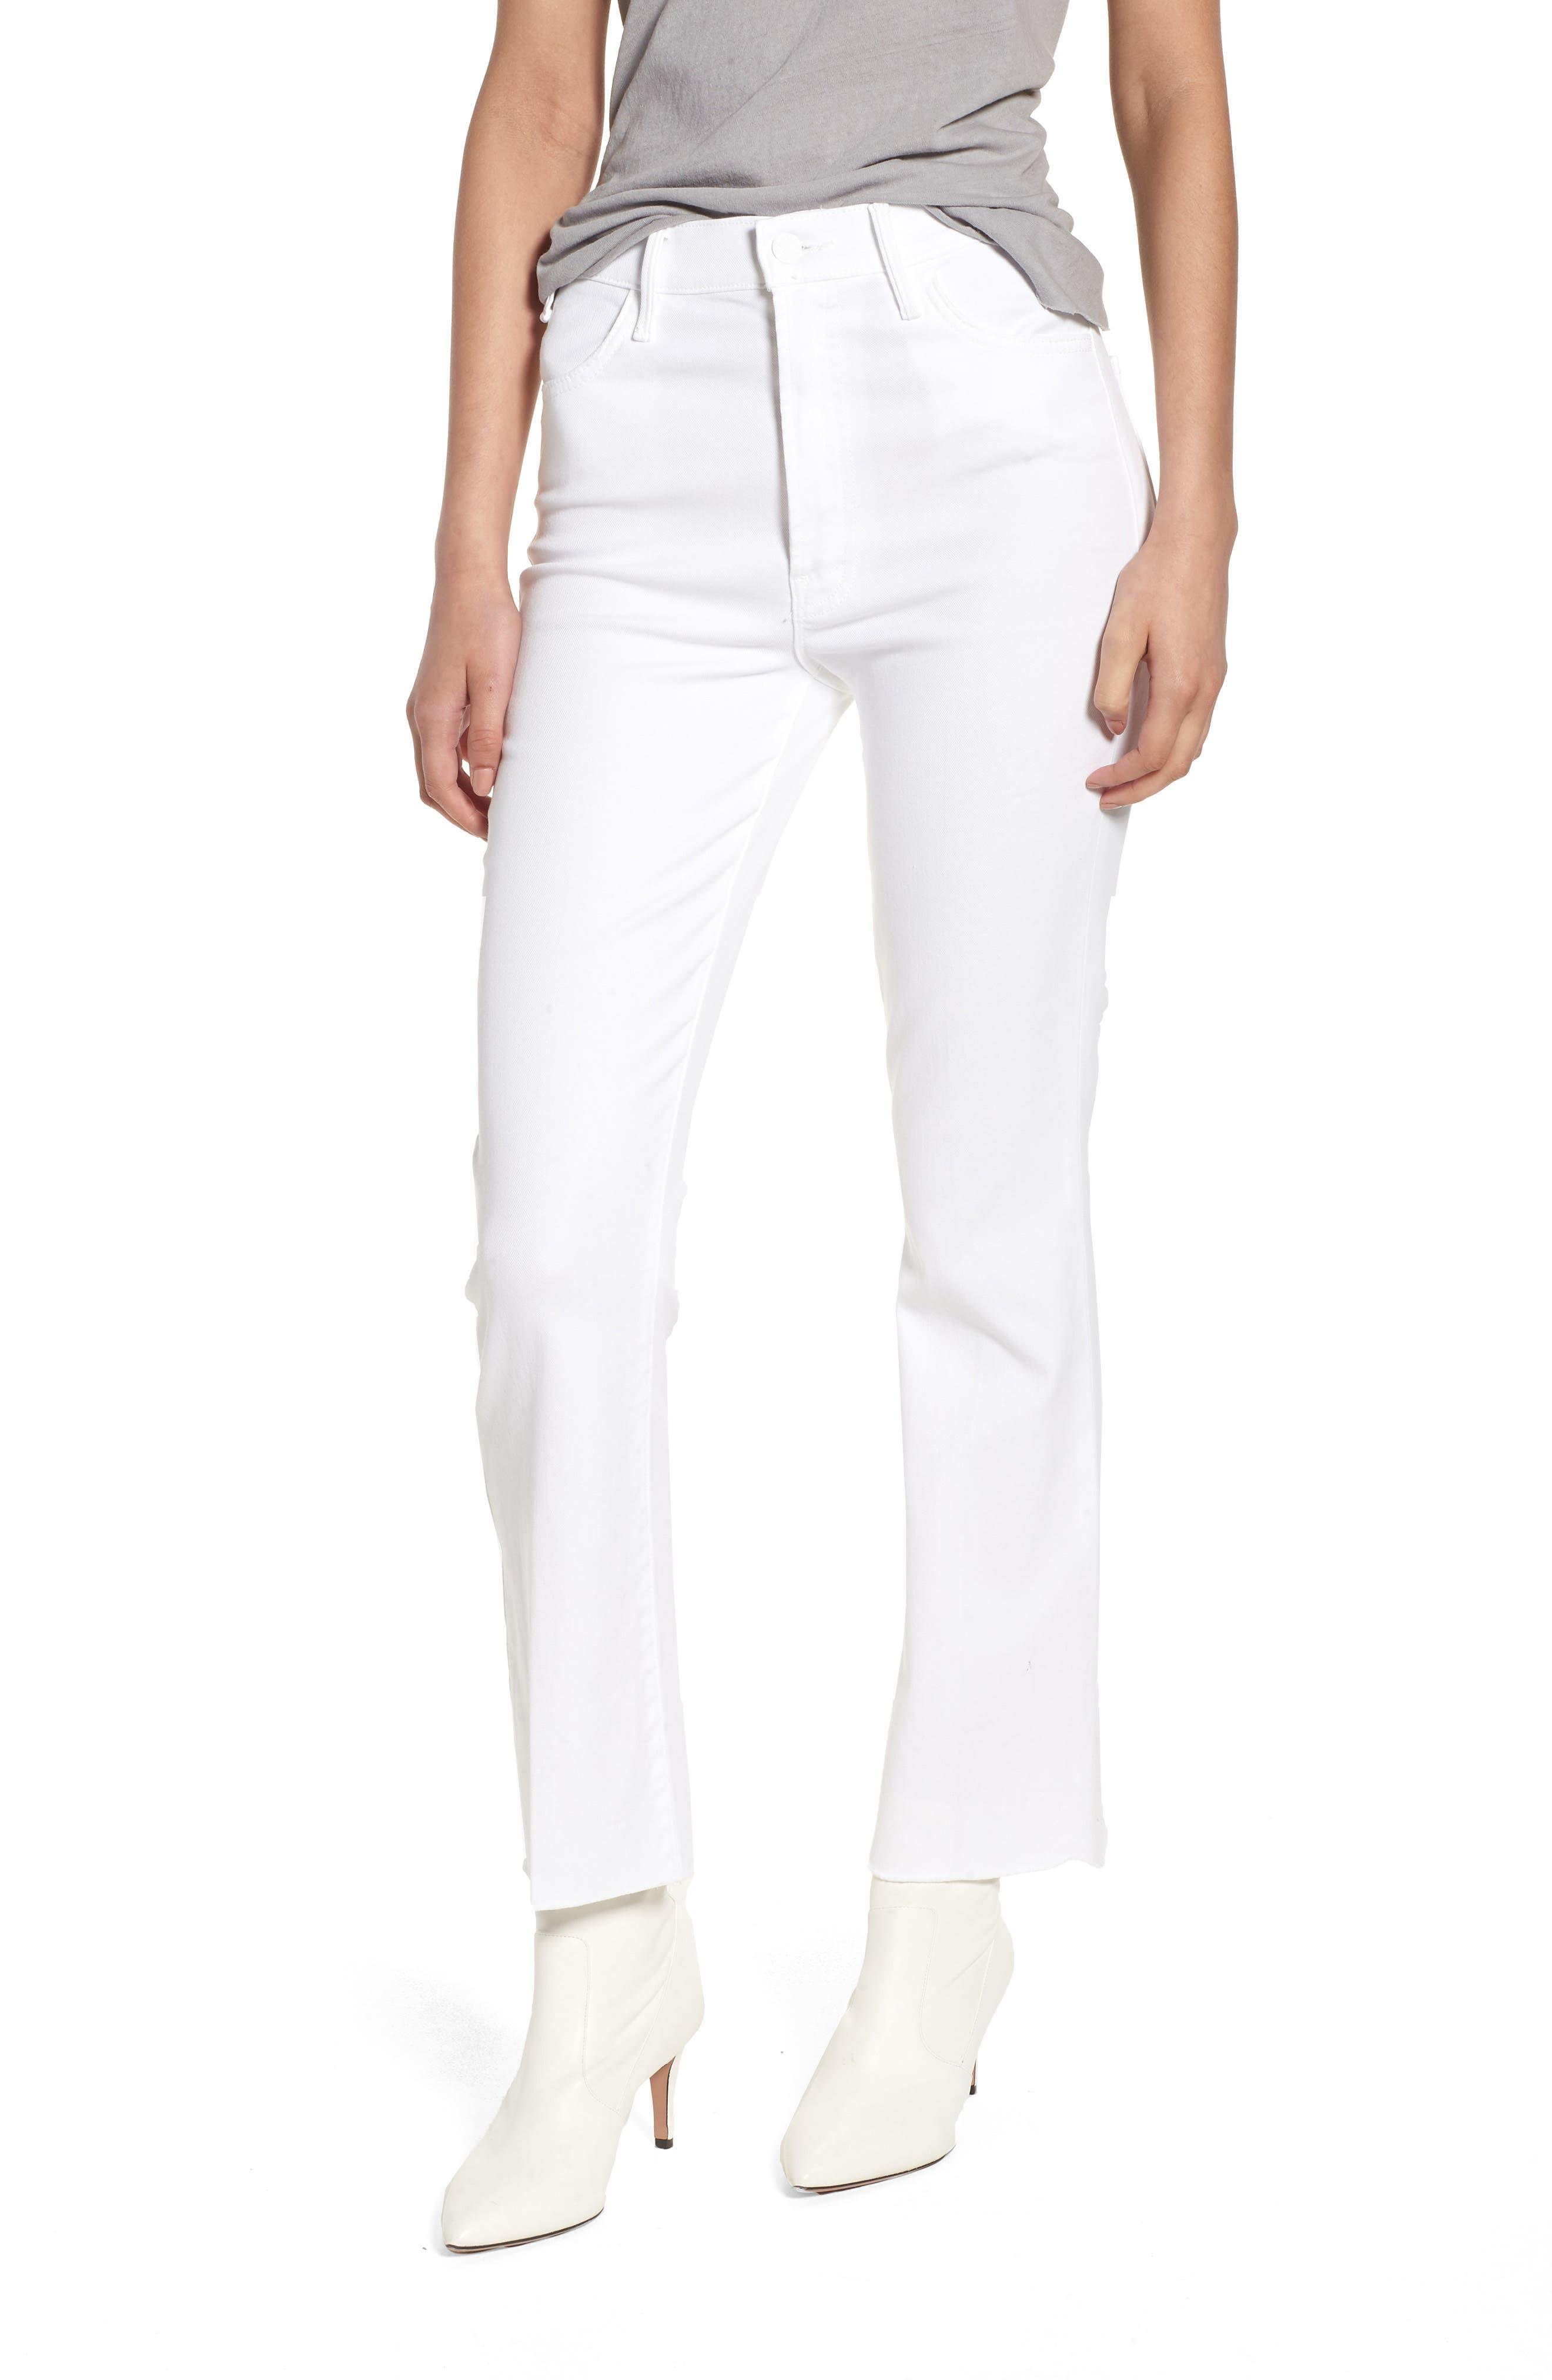 Alternate Image 1 Selected - MOTHER The Hustler Fray Ankle Bootcut Jeans (Glass Slipper)